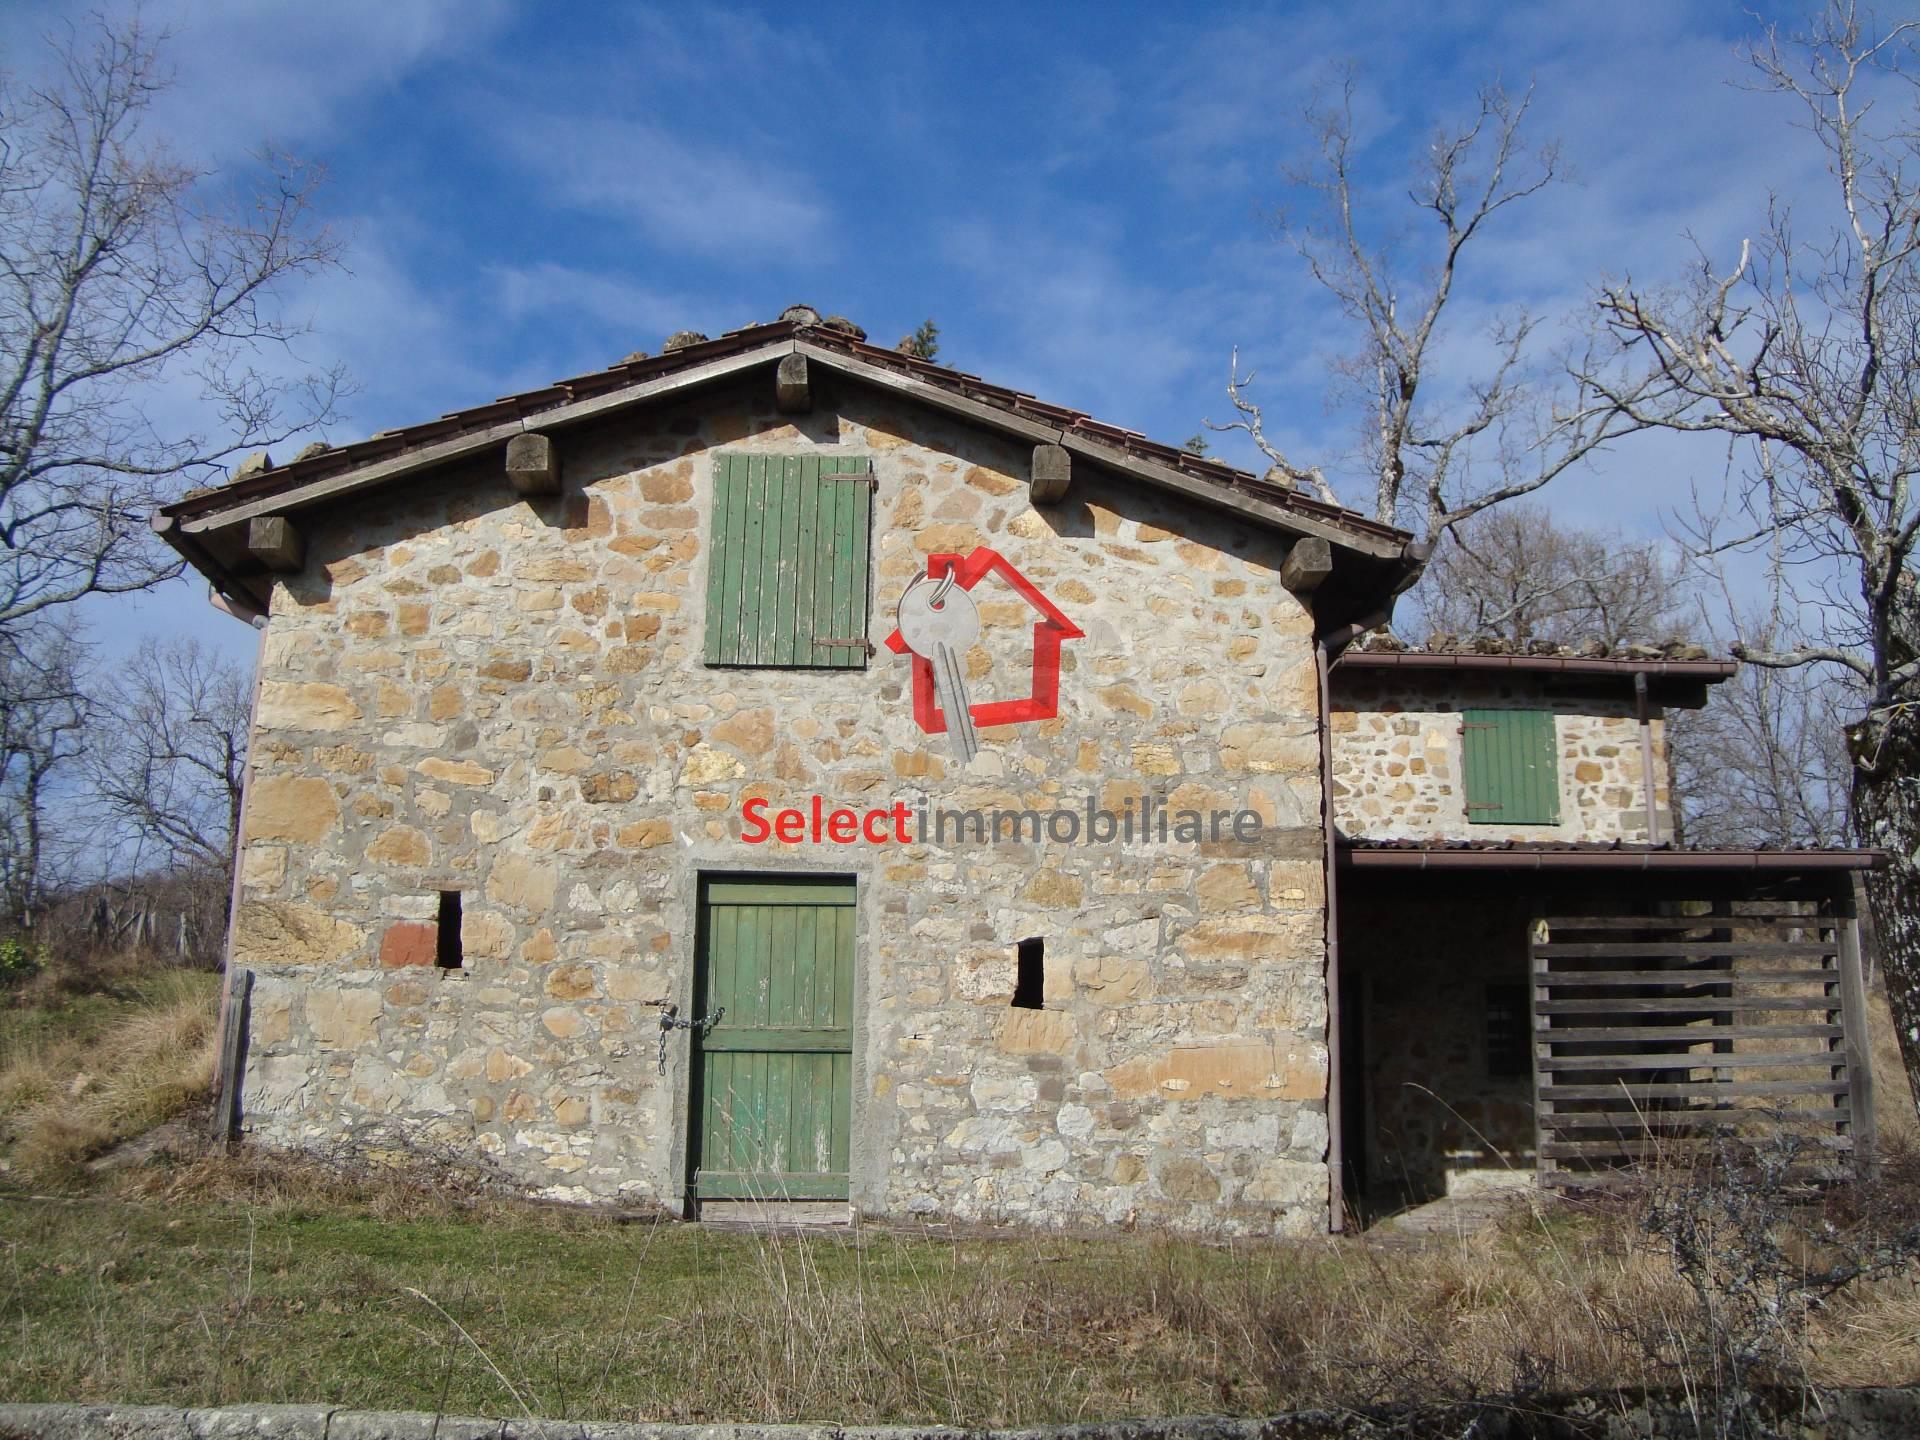 Appartamenti e case in vendita a Bagni di Lucca - Cambiocasa.it